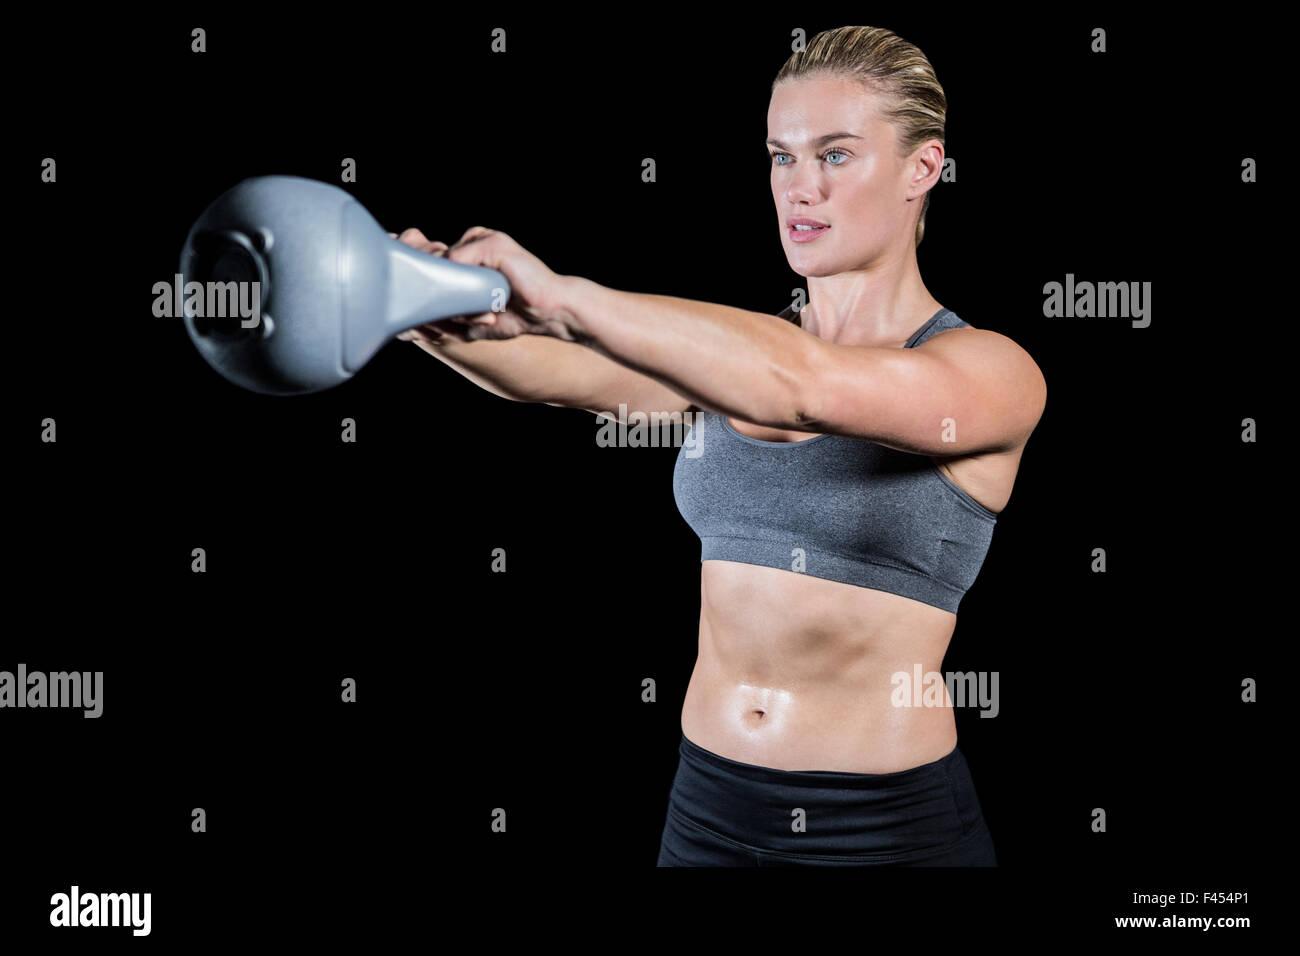 Muscular woman swinging heavy kettlebell Stock Photo